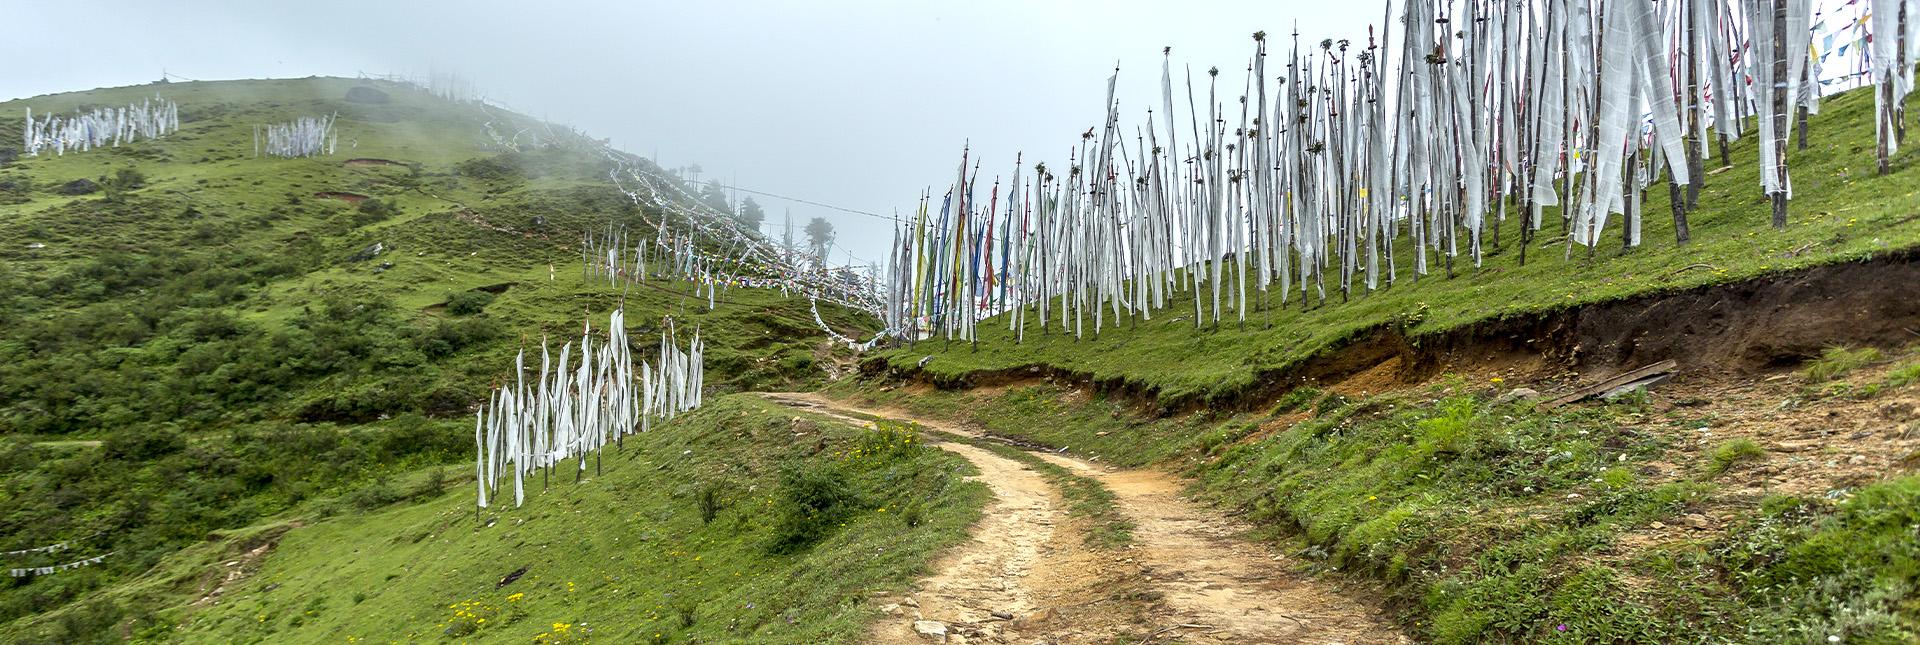 Chele La Trek route